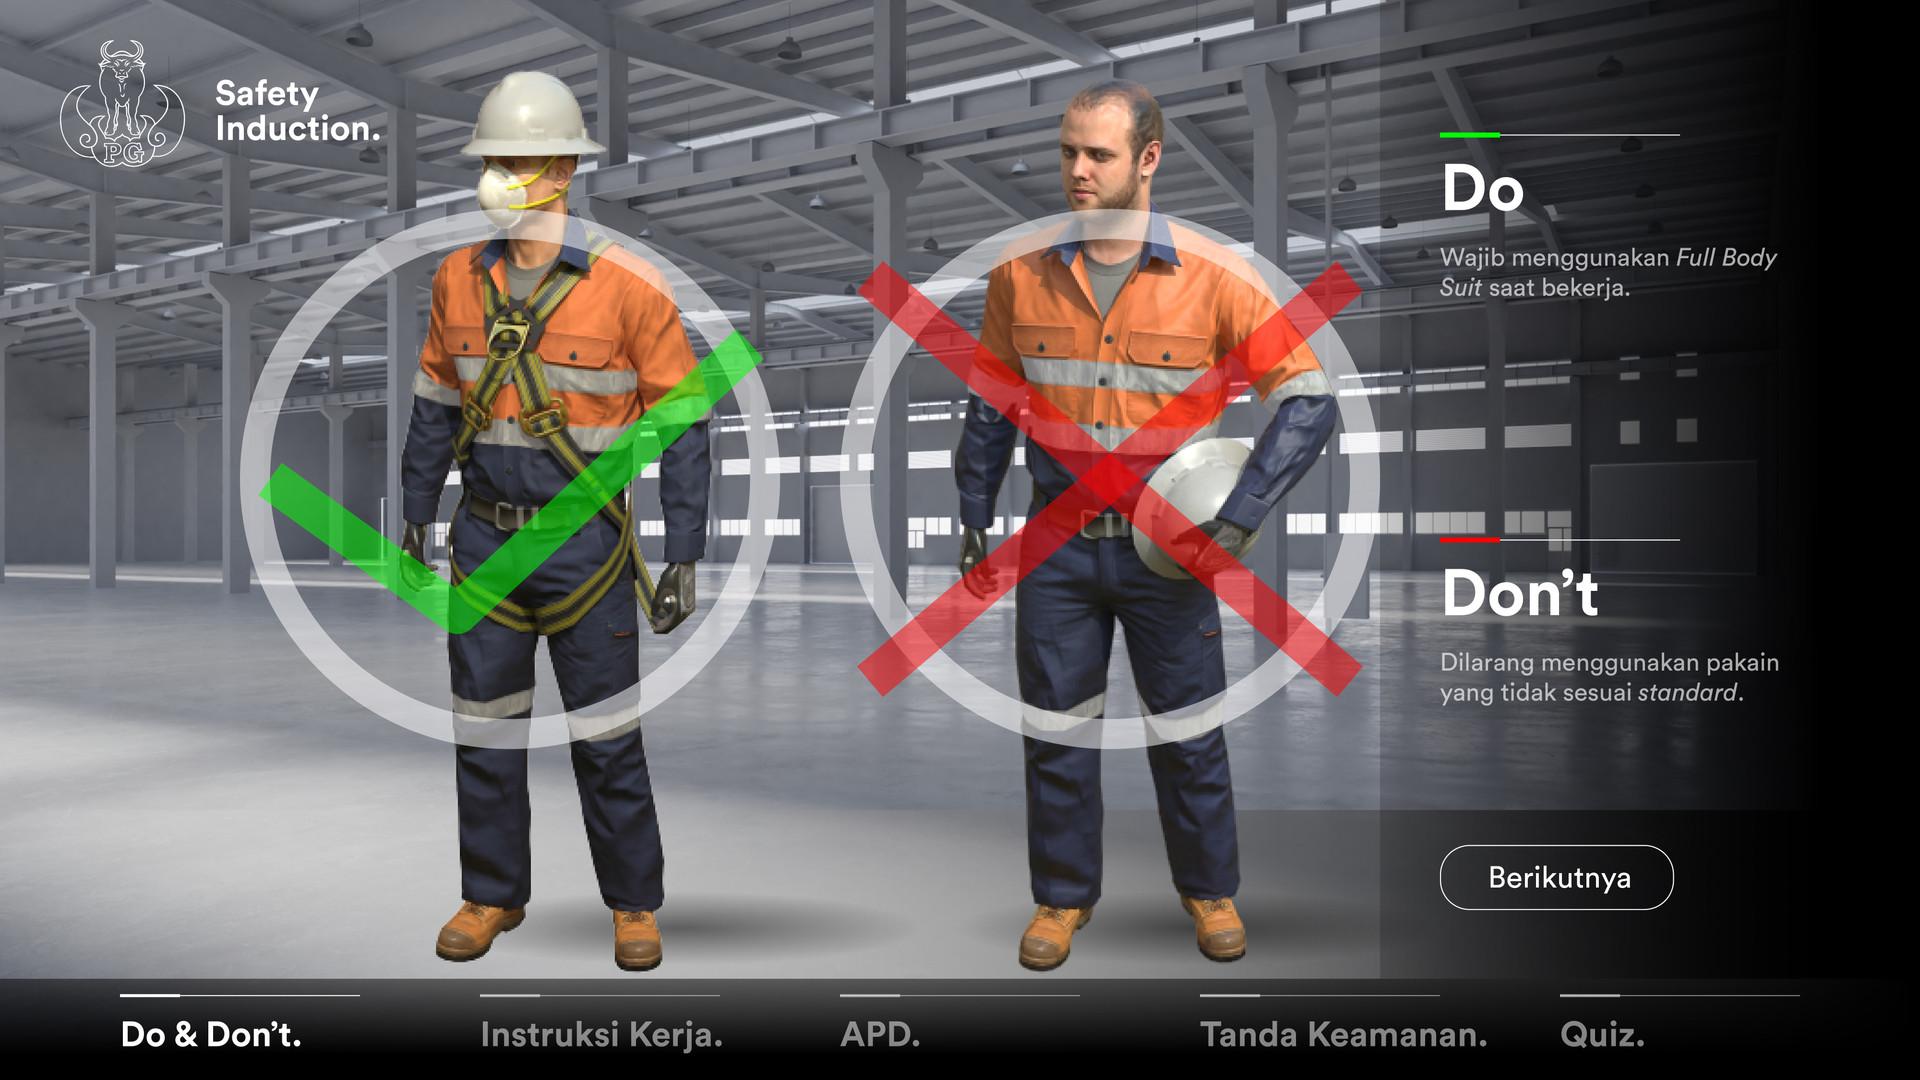 AR Safety Induction Landscape